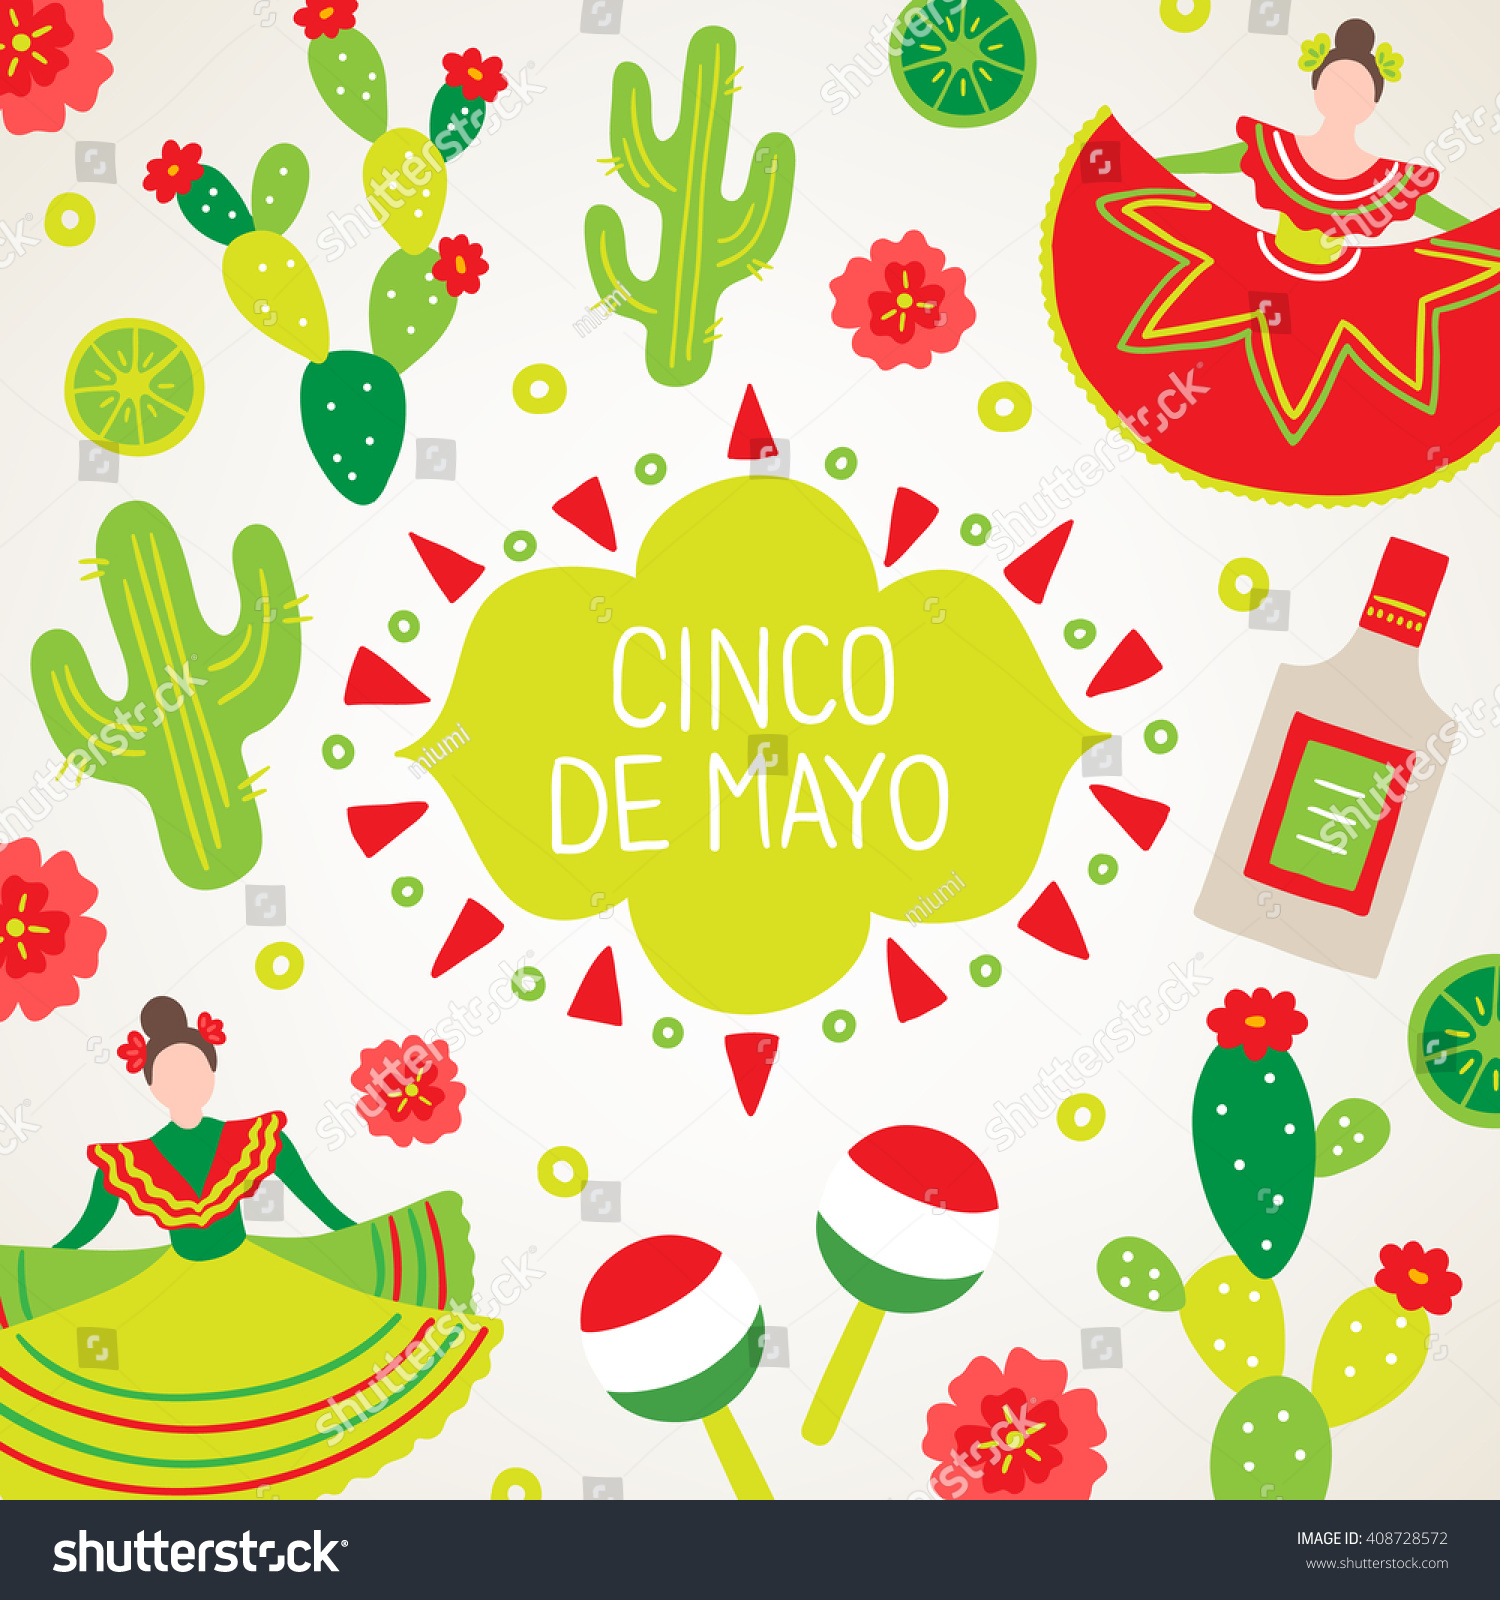 Cinco de mayo fifth may greeting stock vector 408728572 shutterstock cinco de mayo fifth of may greeting card with dancing woman cactus kristyandbryce Gallery